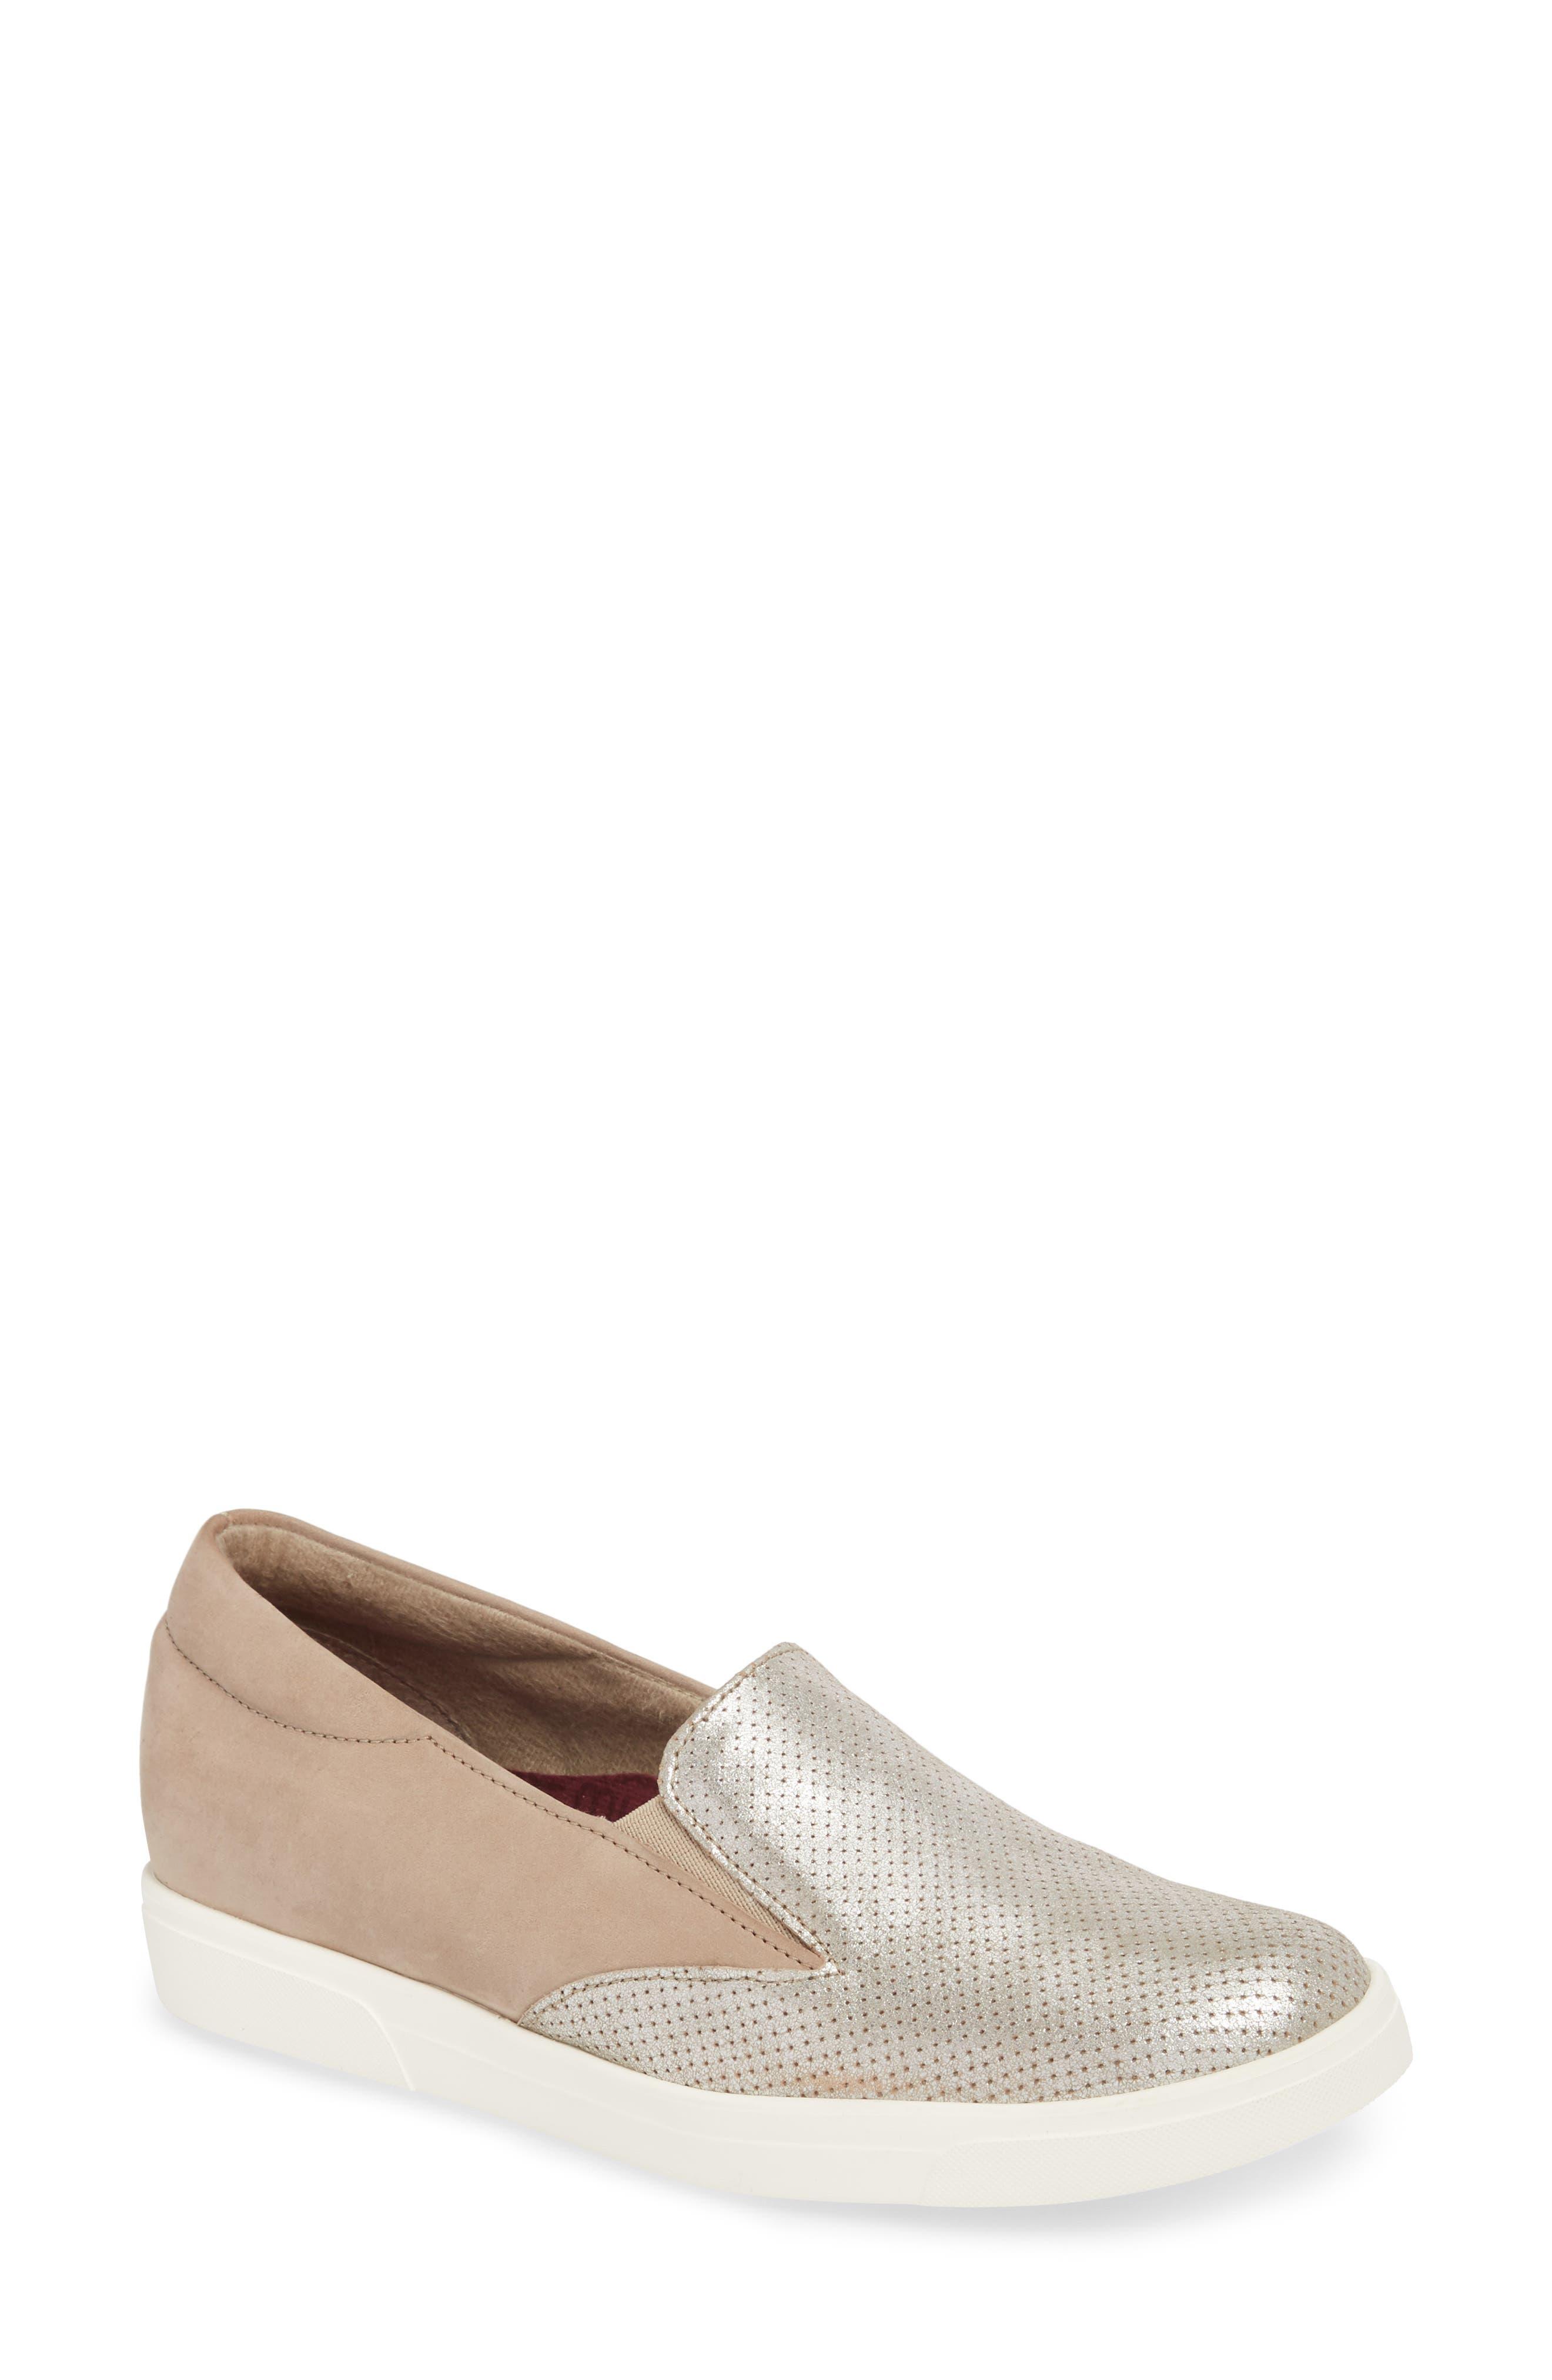 Lulu Slip-On Sneaker,                         Main,                         color, BRUSHED SILVER NUBUCK